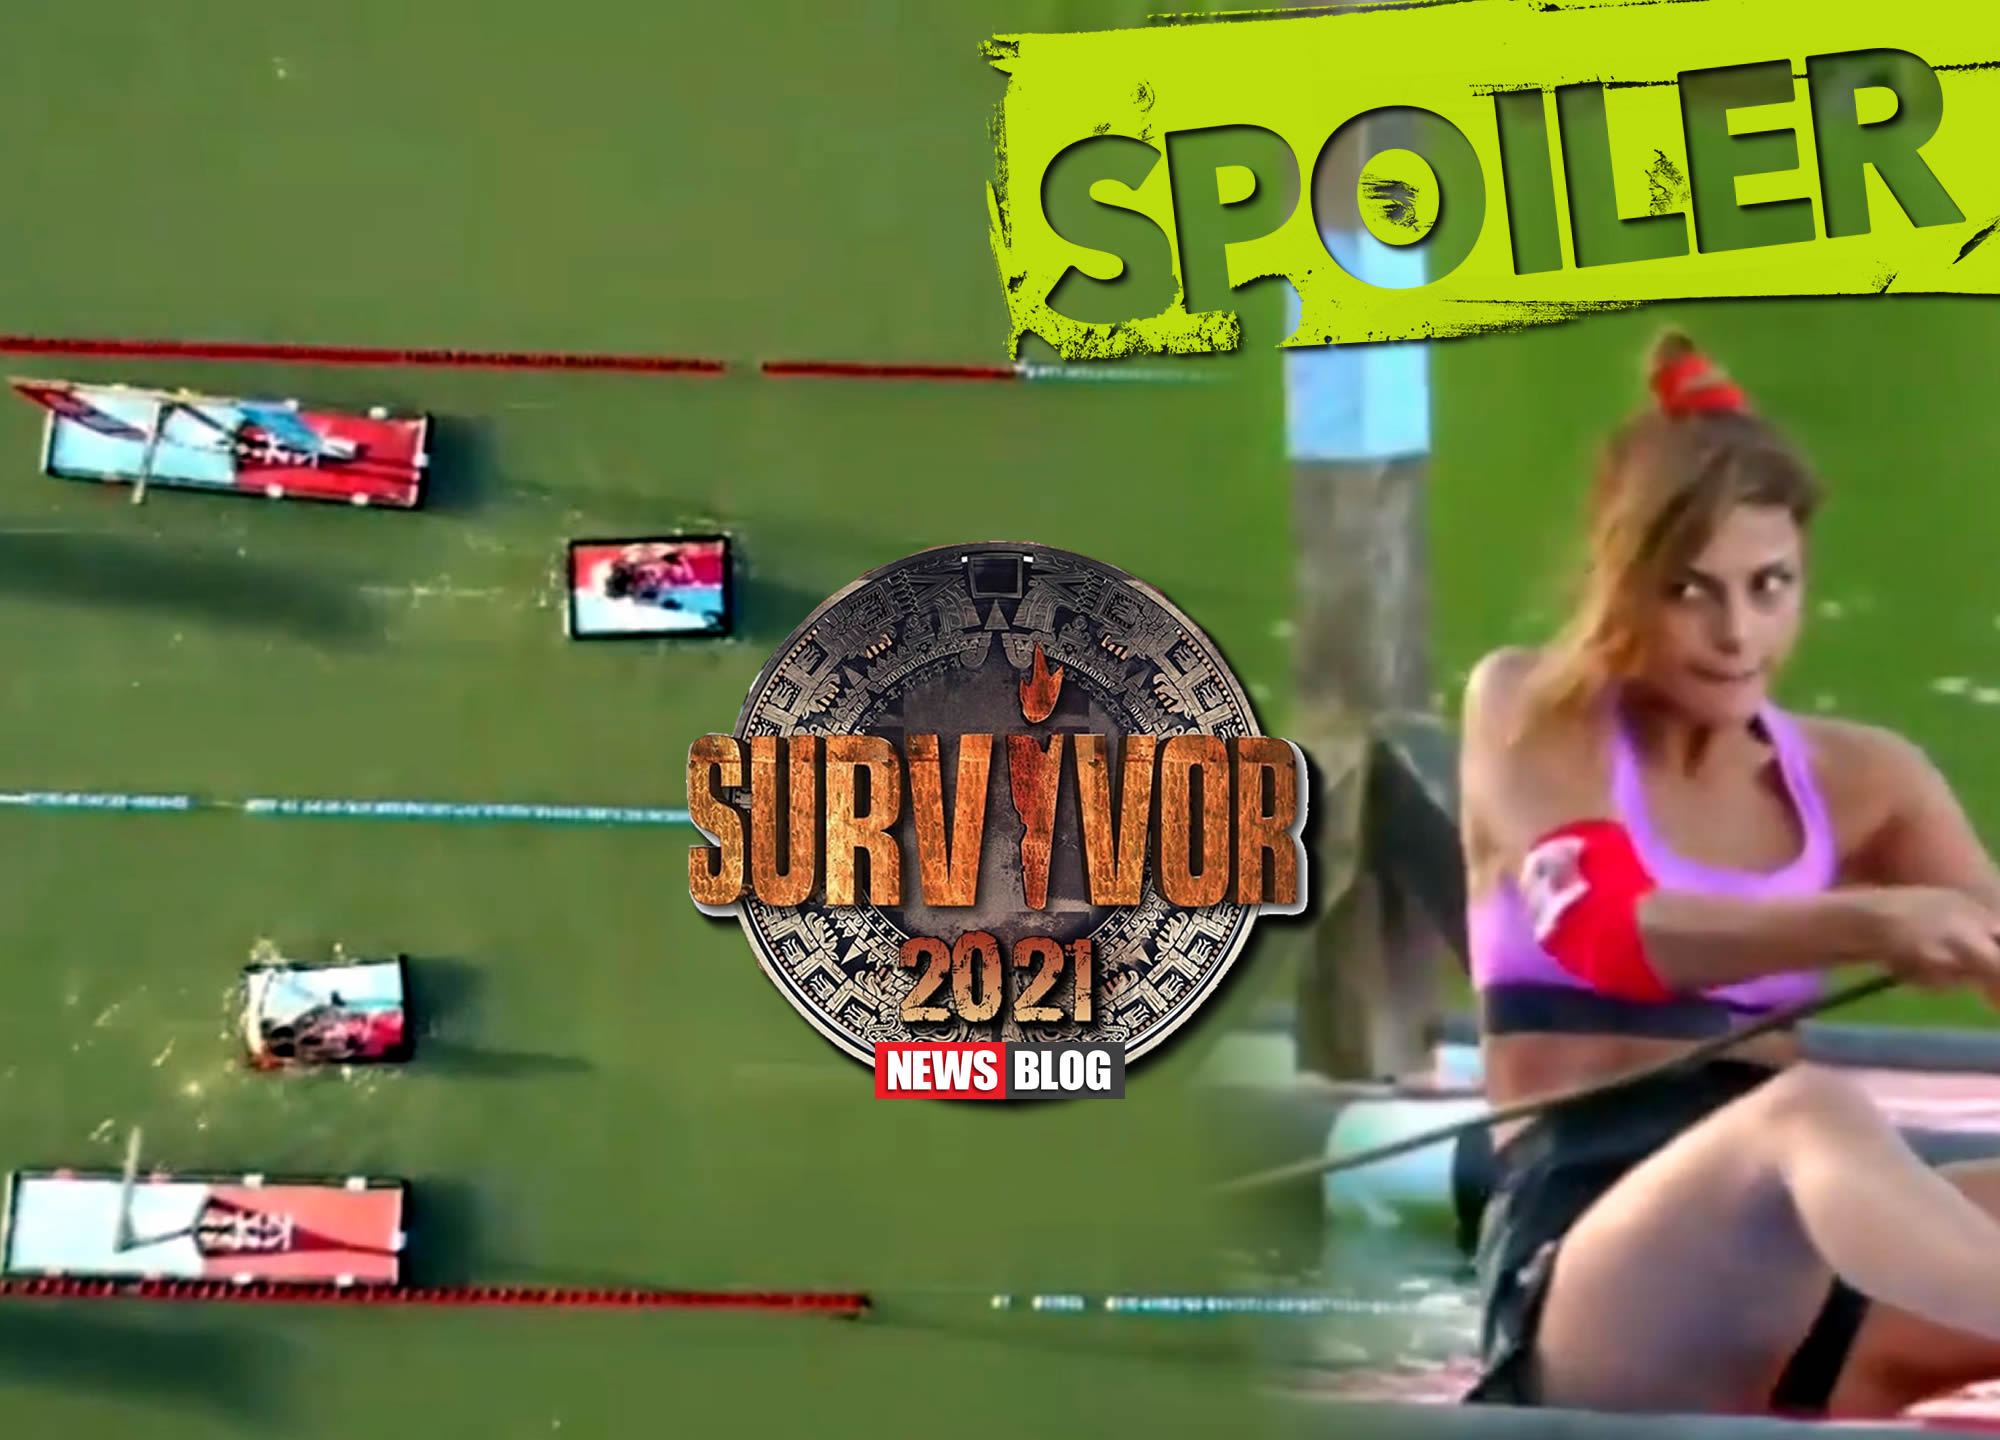 Survivor spoiler 03/01,survivor 2021,survivor 4 spoiler,survivor 4,survivor Ασημίνα Ιγγλέζου,survivor Ανθή Σαλαγκούδη,survivor αγώνισμα επάθλου